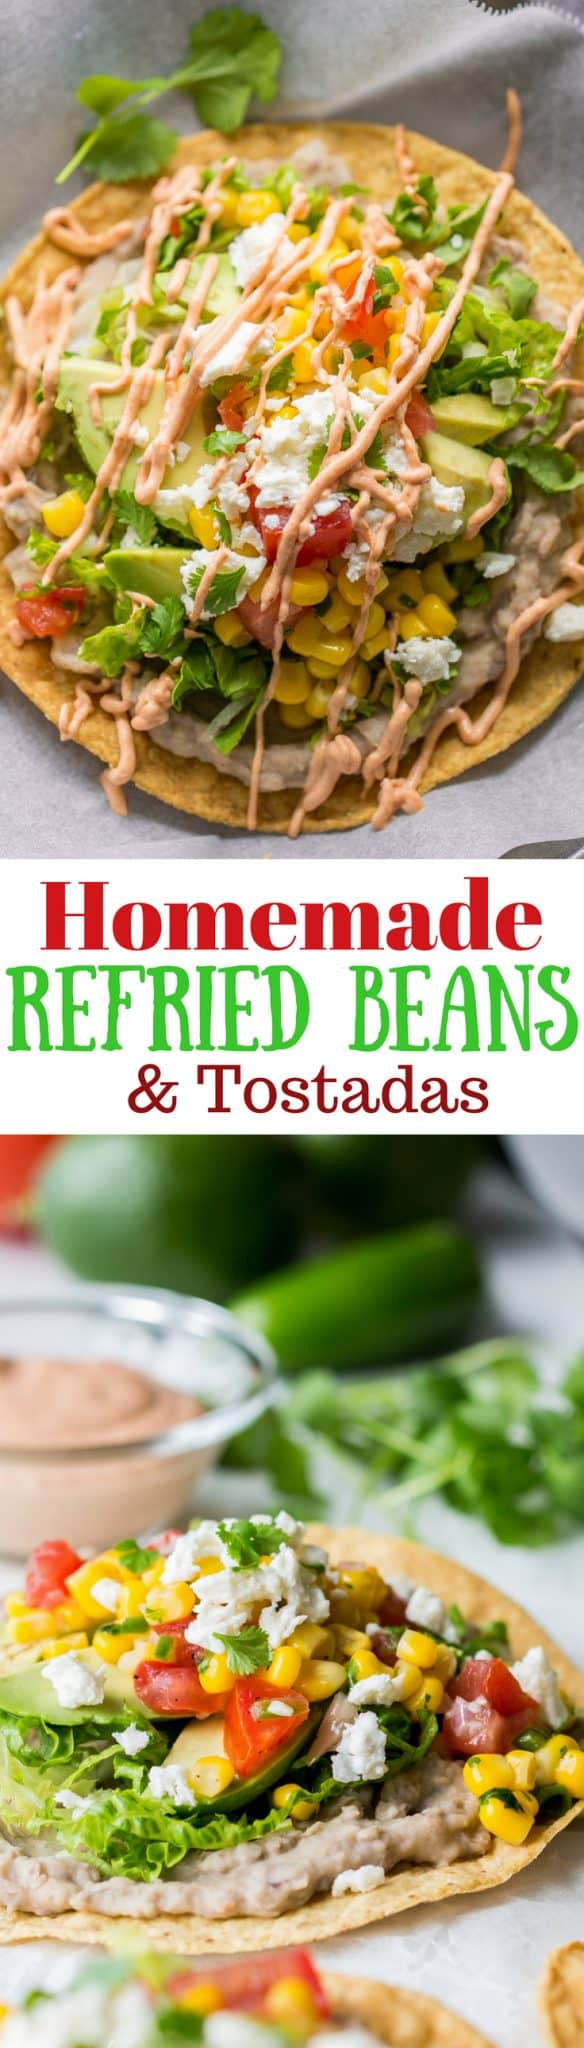 Creamy spicy Homemade Refried Beans. A wonderful side dish or great base for tacos, burritos, quesadillas, nachos or tostadas. www.savingdessert.com